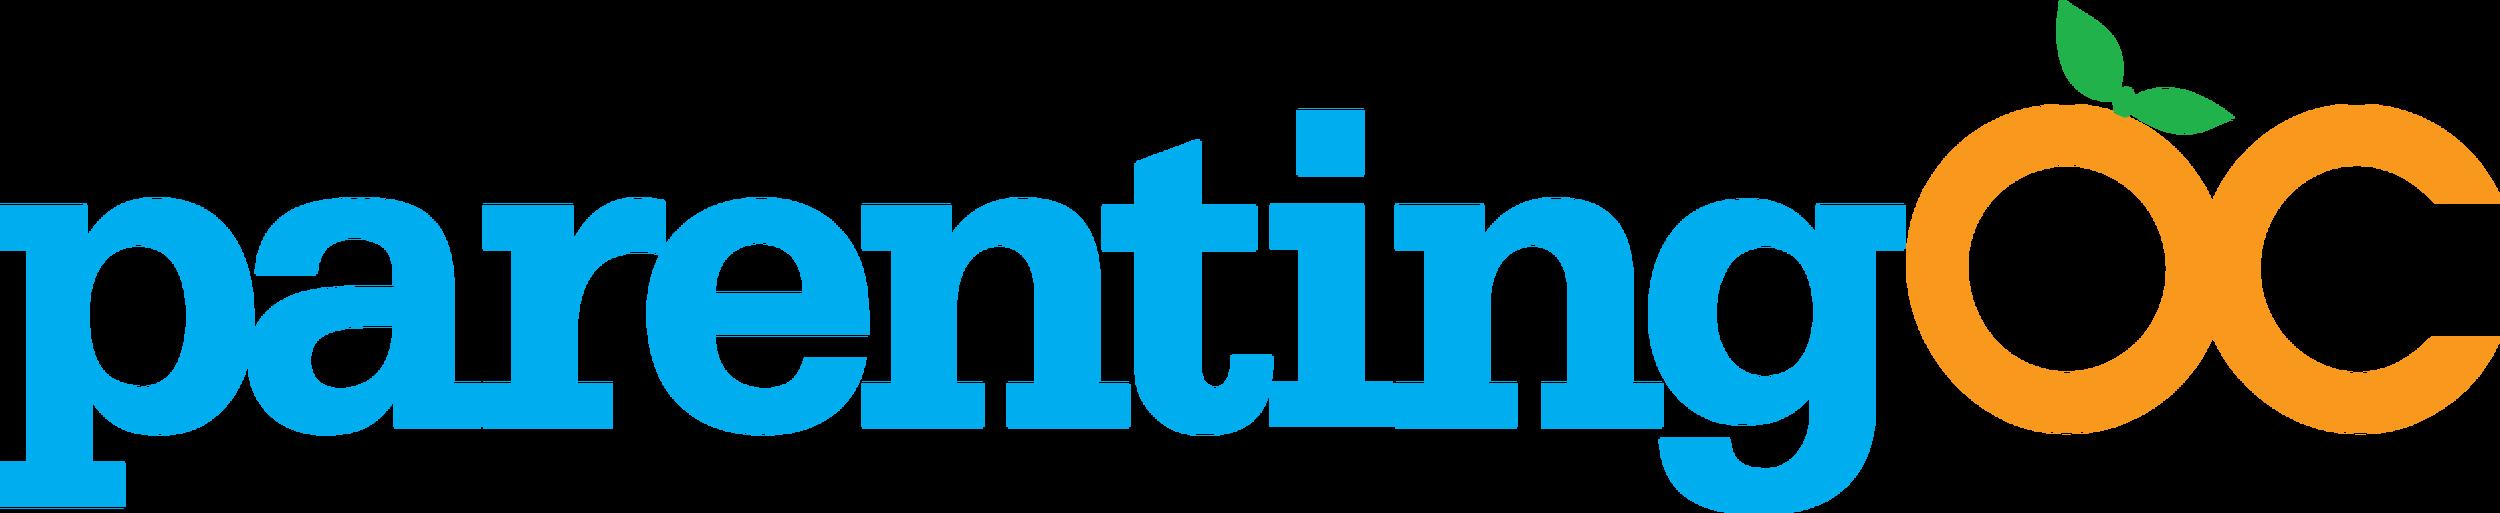 Parenting-OC-logo.png